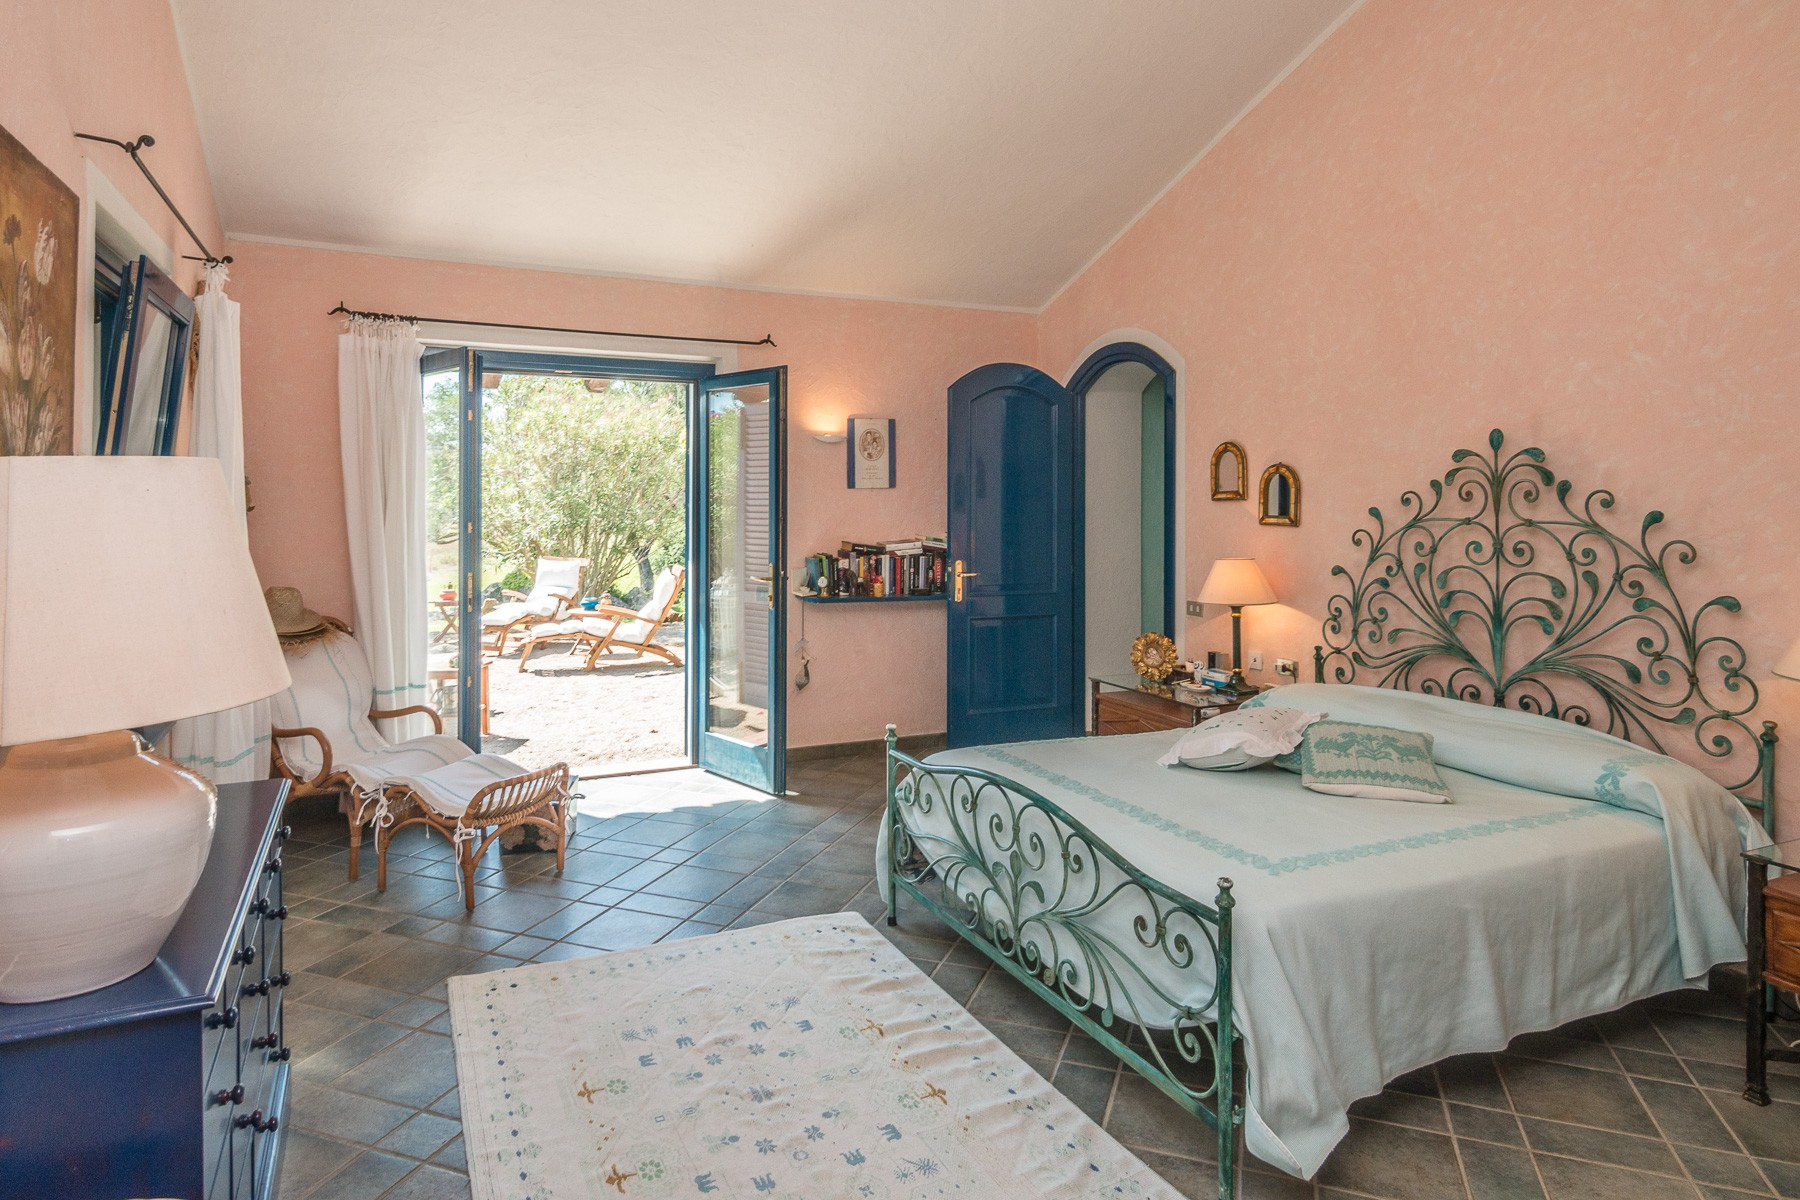 Casa indipendente in Vendita a Olbia: 5 locali, 230 mq - Foto 13